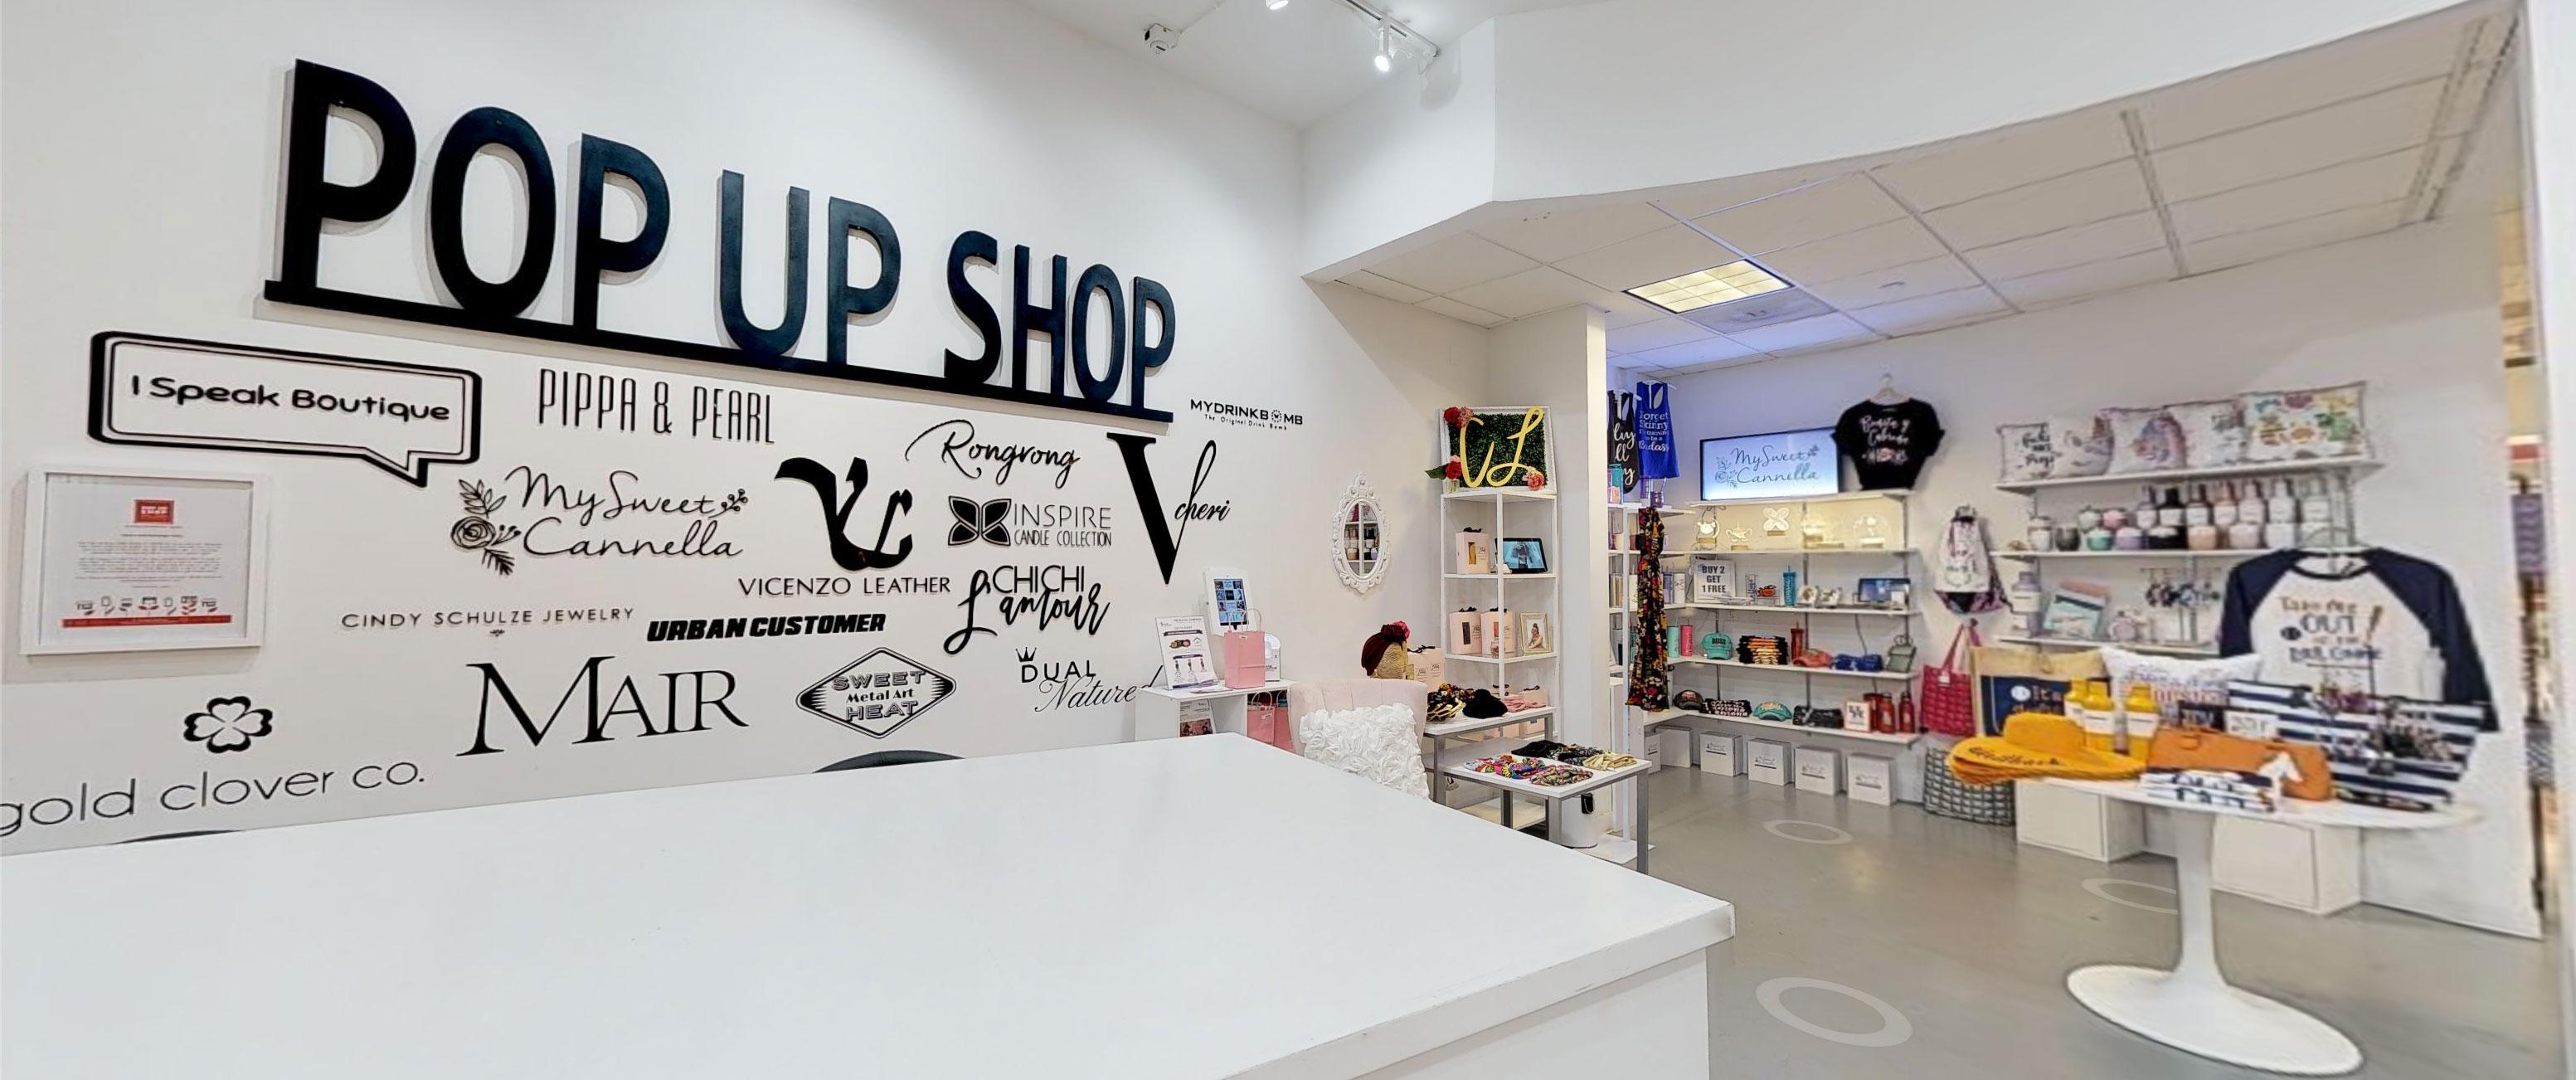 I Speak Boutique – Galleria Mall Pop Up Shops – PopUp Shops